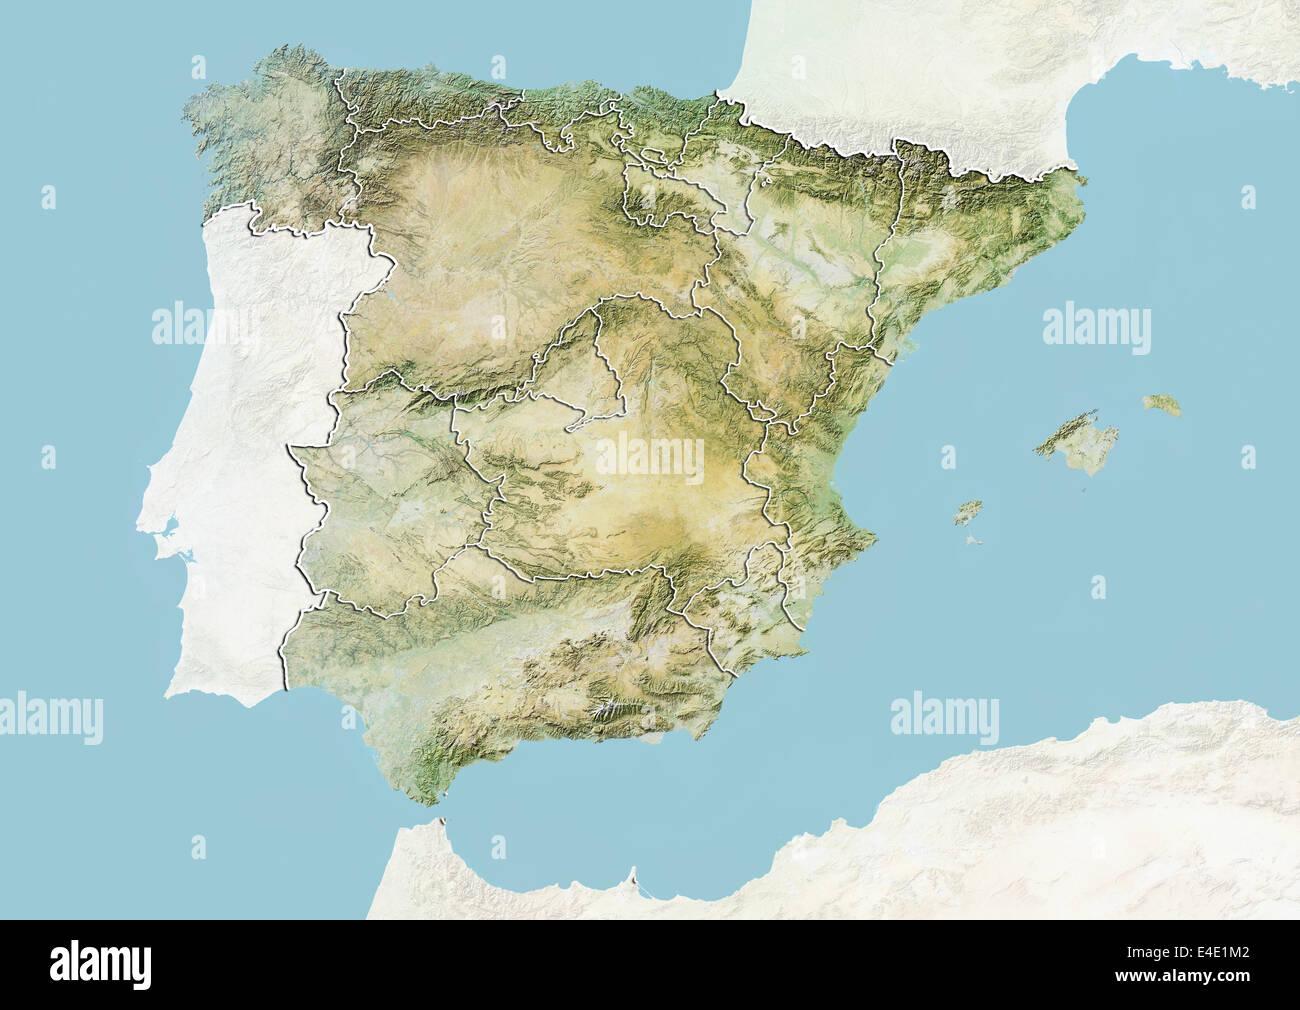 Spain Map Regions Stockfotos & Spain Map Regions Bilder - Alamy